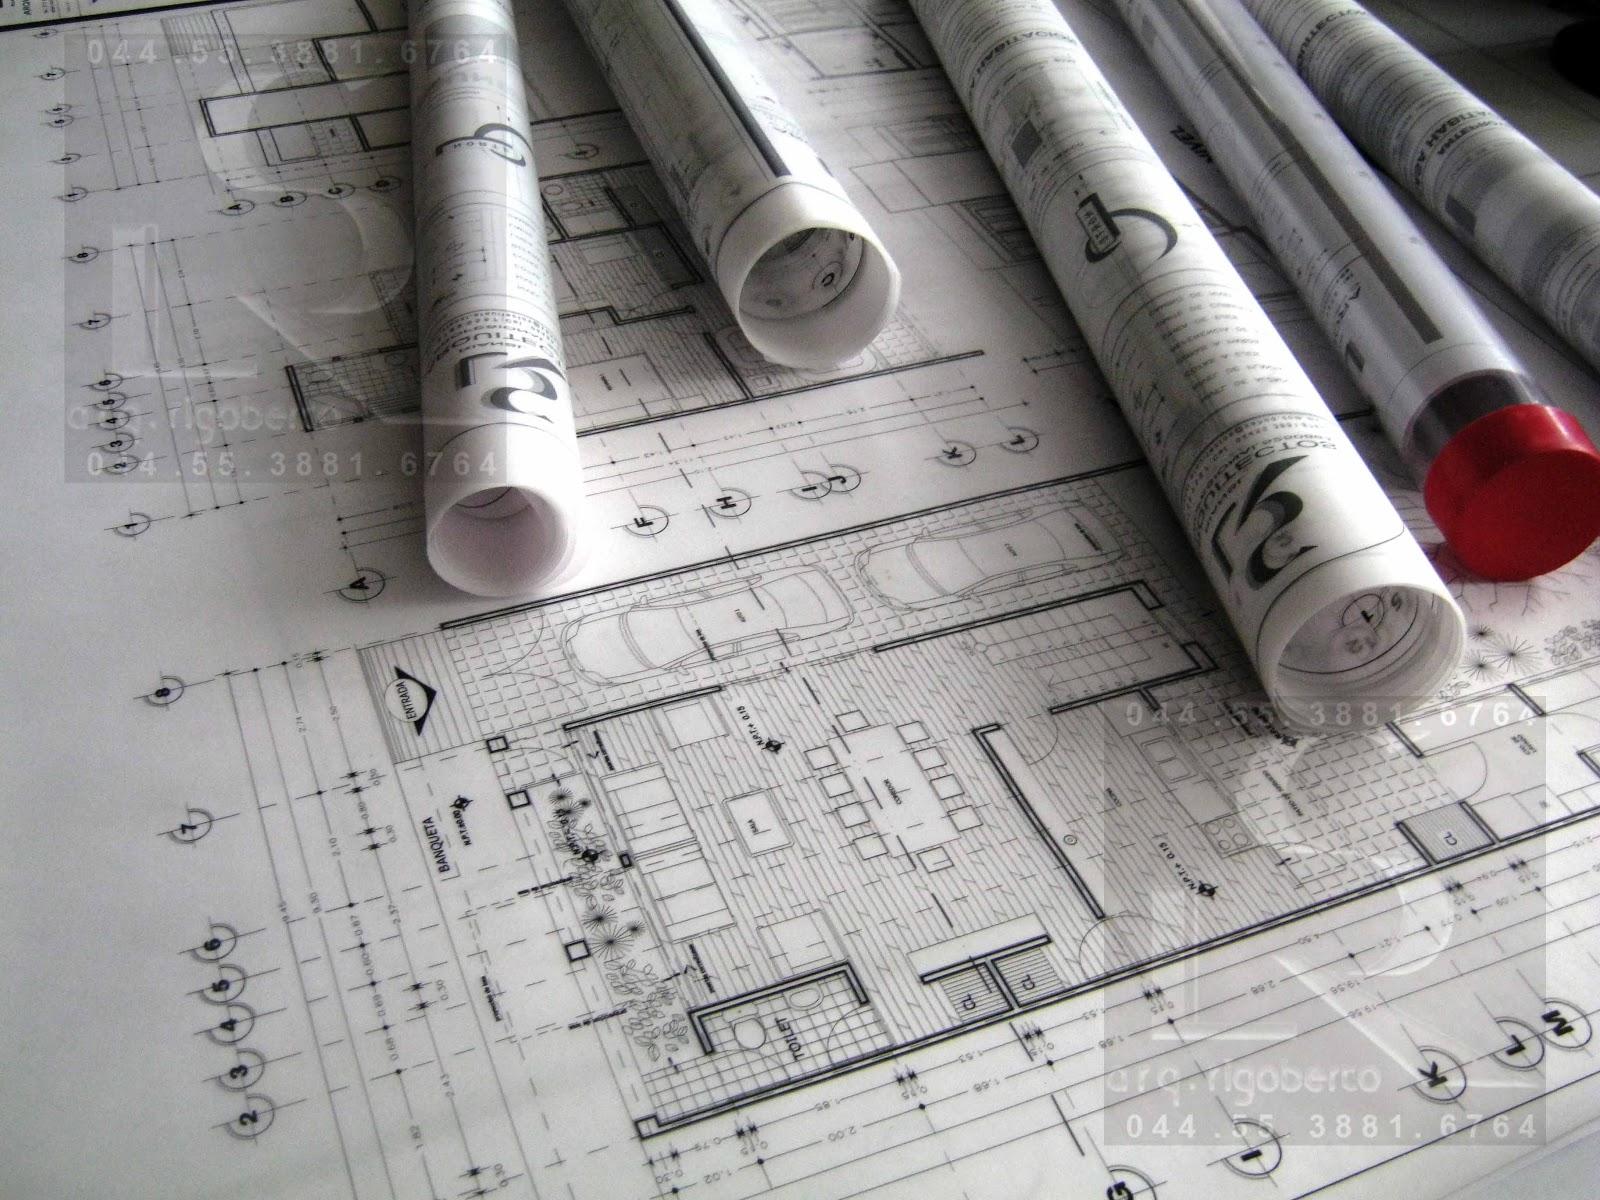 Dise o arquitect nico en 3d proyectos arquitect nicos en - Arquitectos madrid 2 0 ...